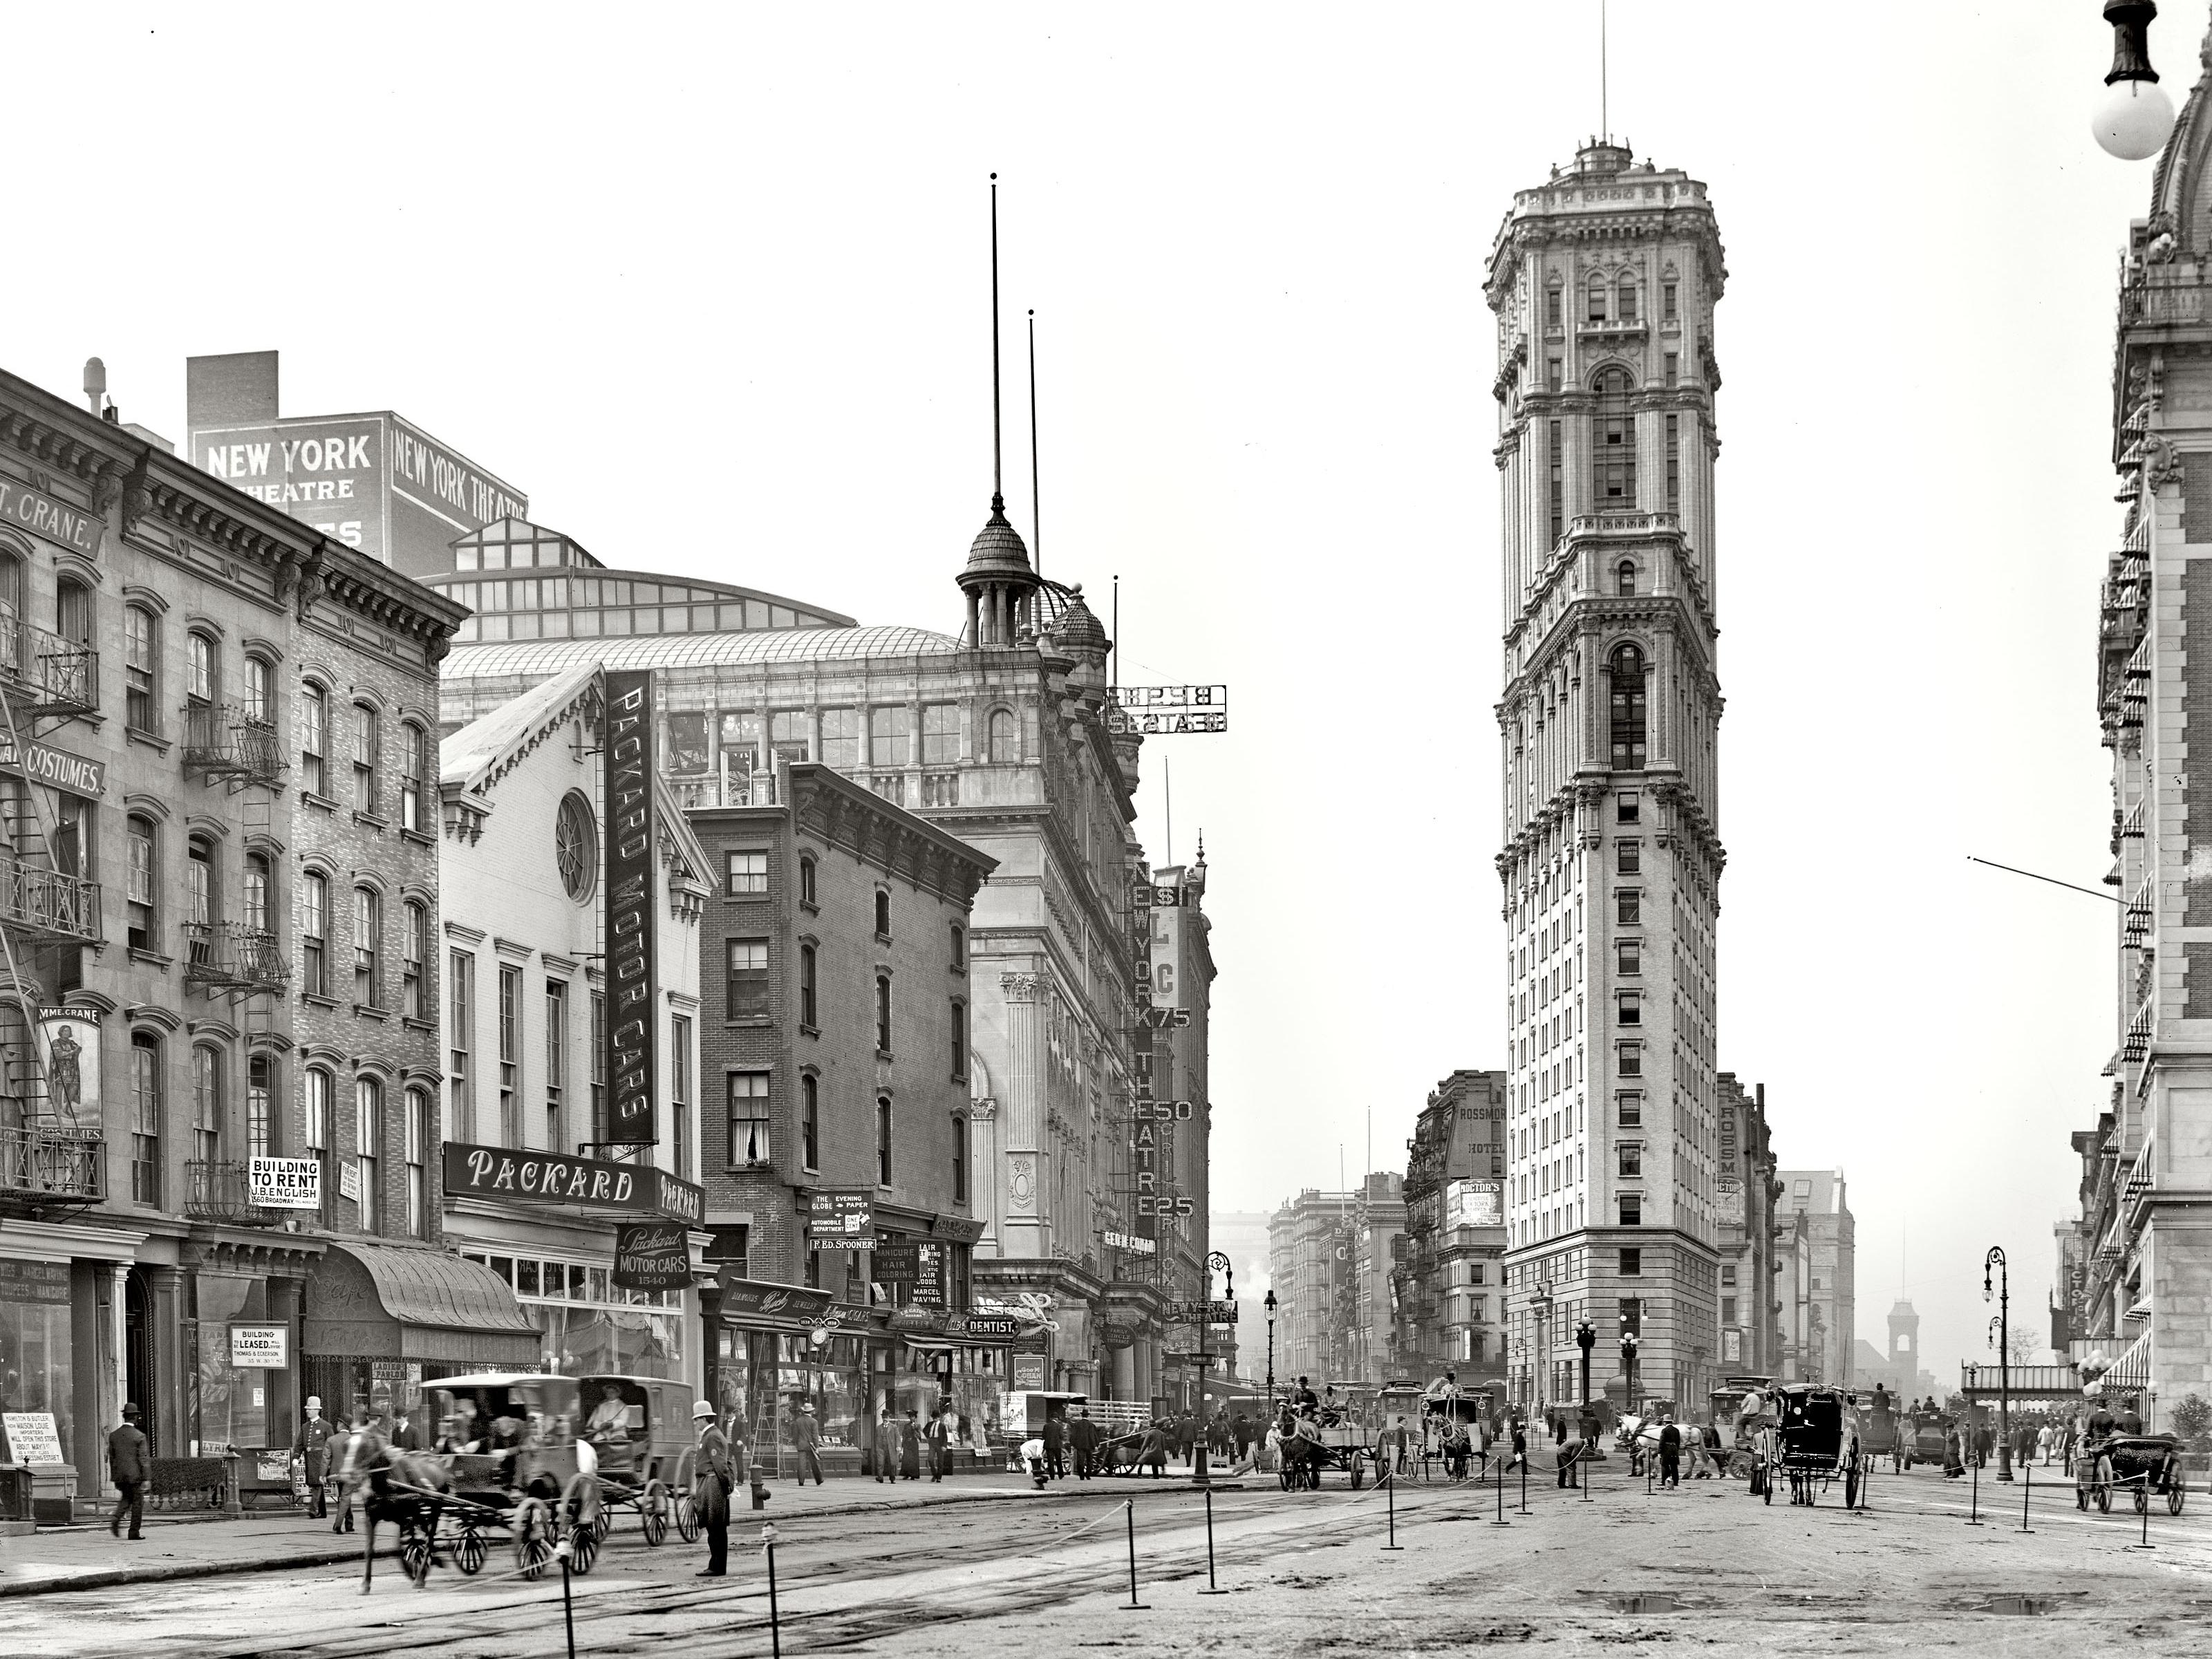 New york city times square in manhattan fonds d 39 cran for Photo ecran times square